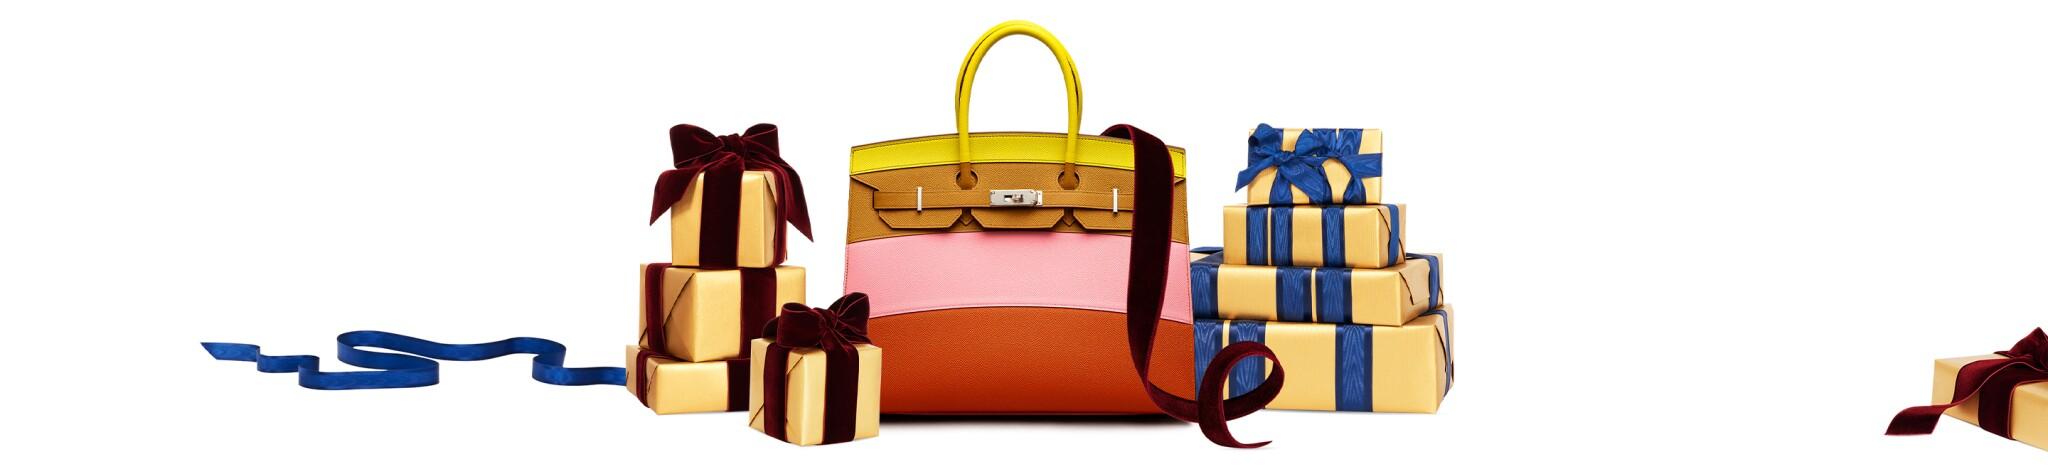 The Luxury Edit: Handbags